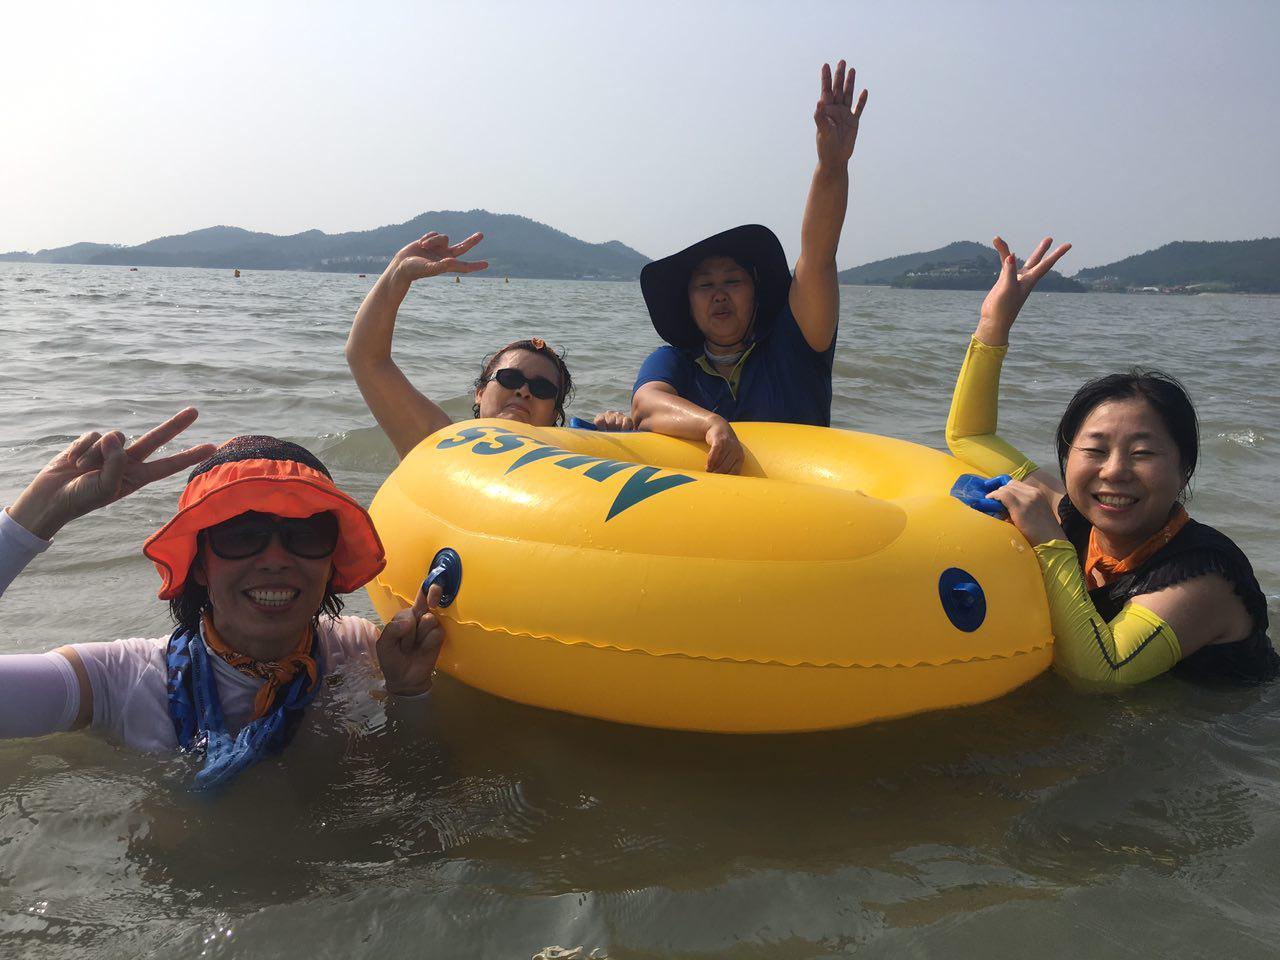 photo_2016-08-13_14-22-09.jpg